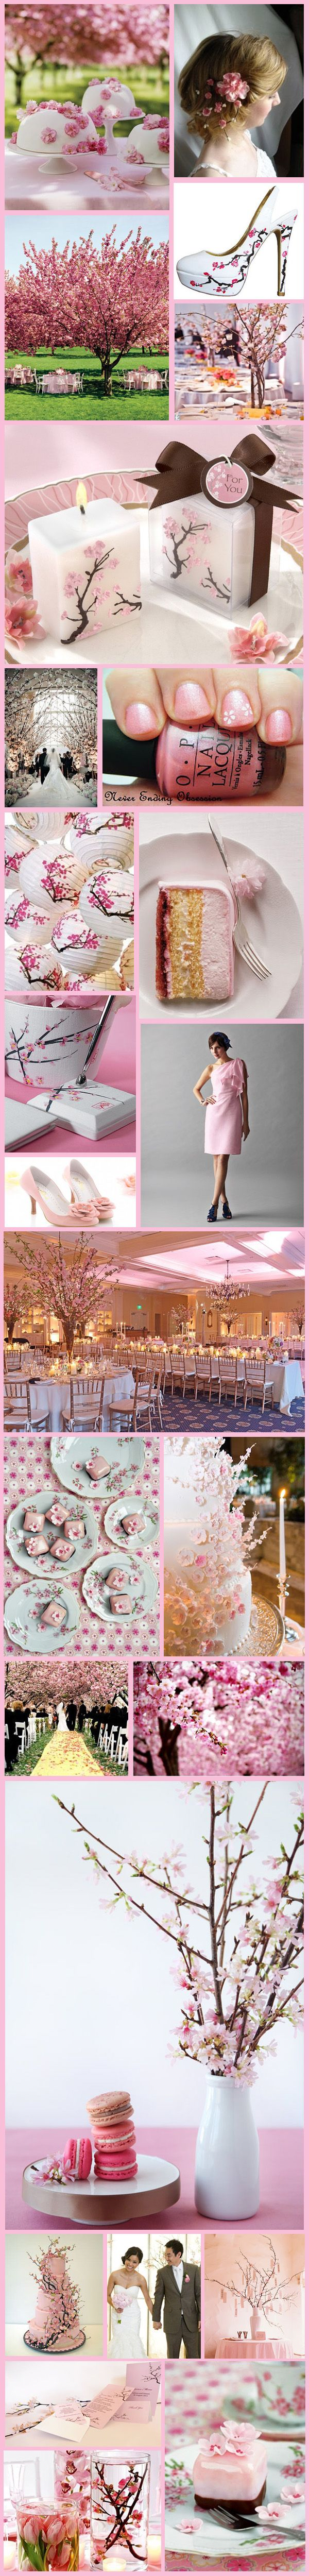 Wednesday Wedding Inspiration: Cherry Blossom Inspiration Board                        via bespoke-bride.com  -  Wendy Schultz - Bridal Parties.